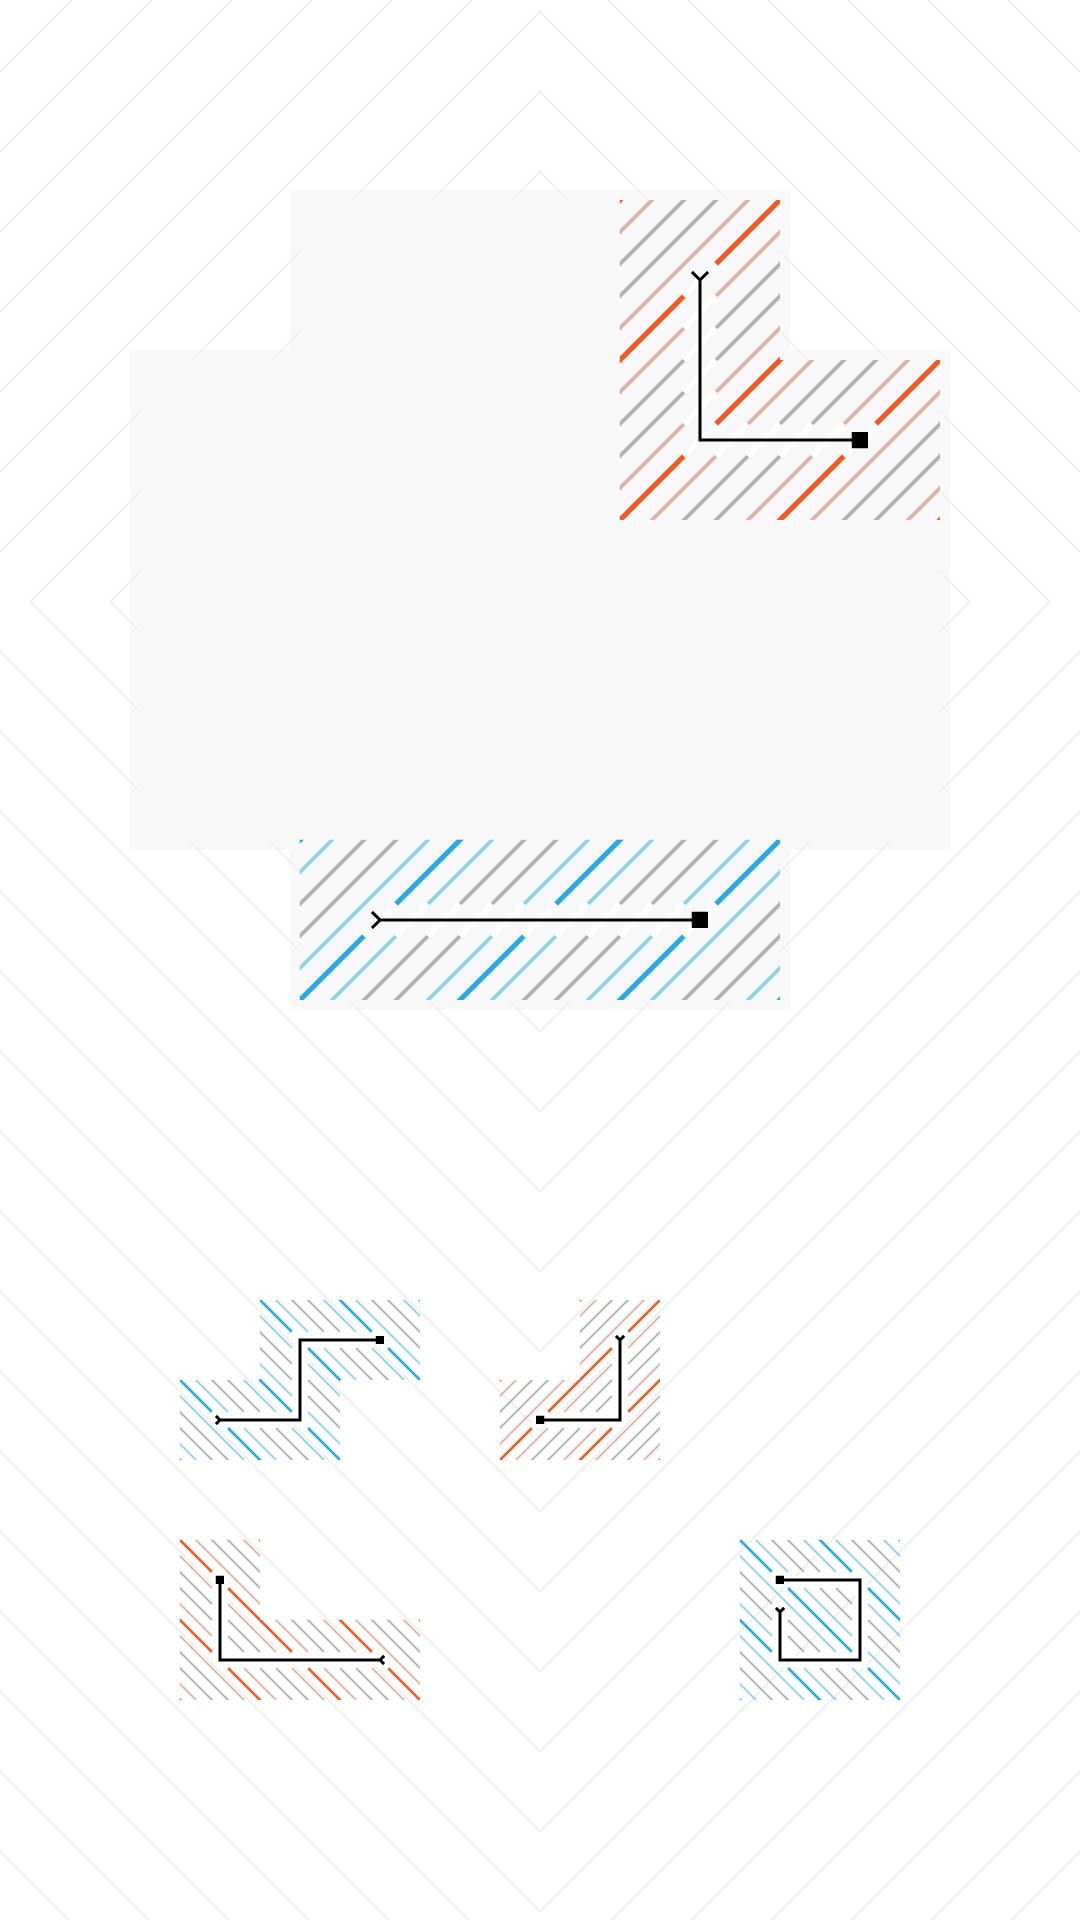 level-appearance-8.jpg